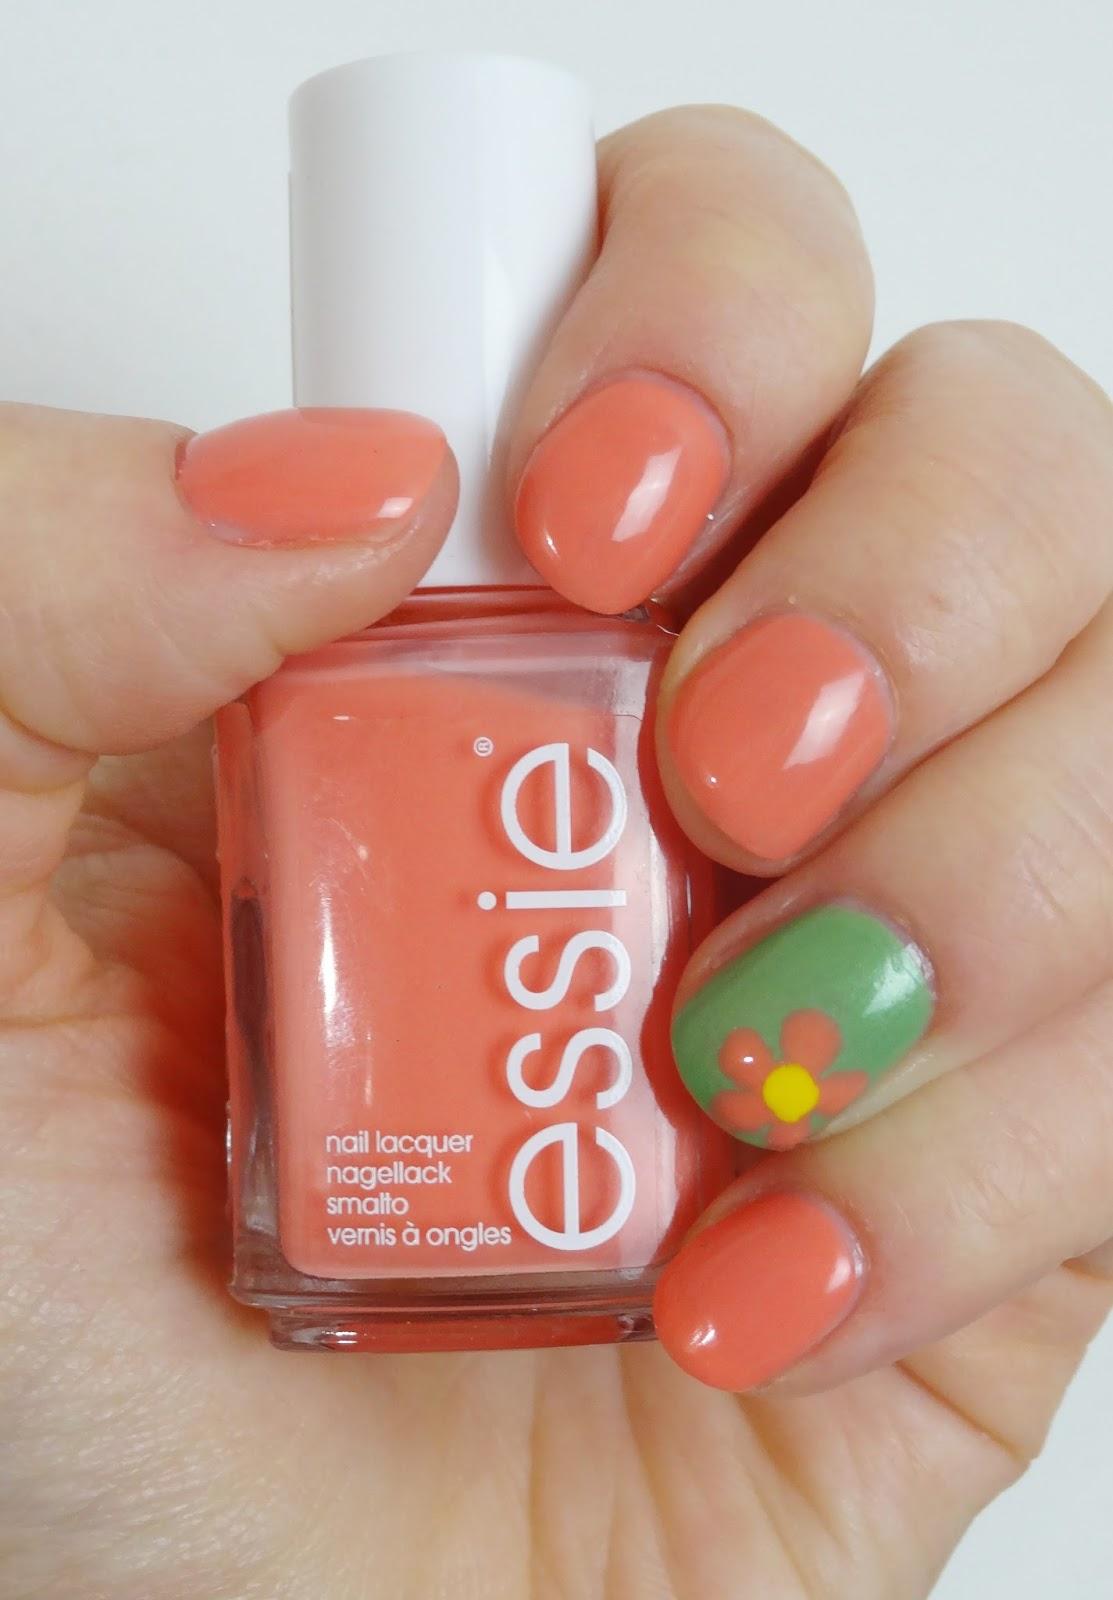 Essie - Resort Fling Nagellack Pretty Clover Beautyblog